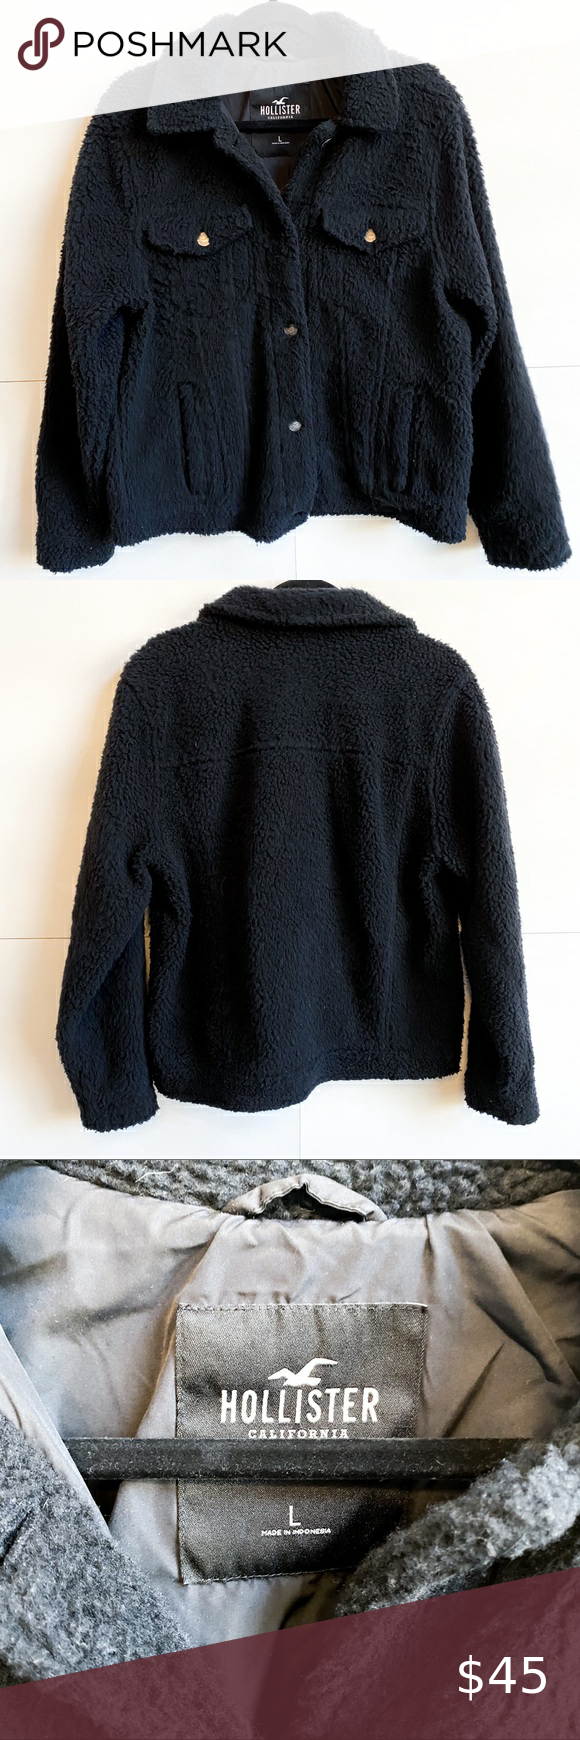 Hollister Black Sherpa Button Up Coat Jacket Fur Hood Jacket Hooded Denim Jacket Hollister Jackets [ 1740 x 580 Pixel ]